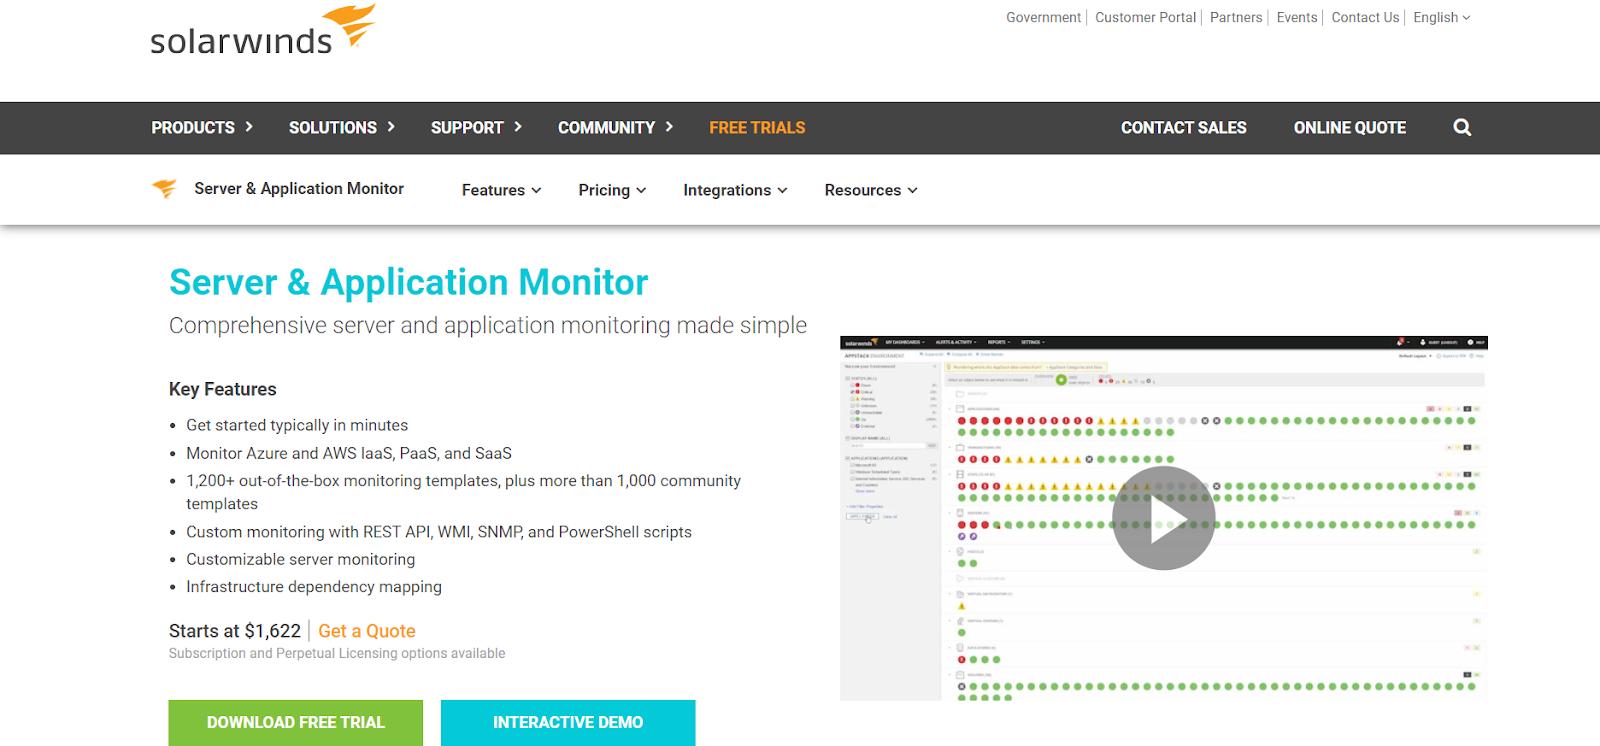 SolarWinds Server Application Monitoring Software